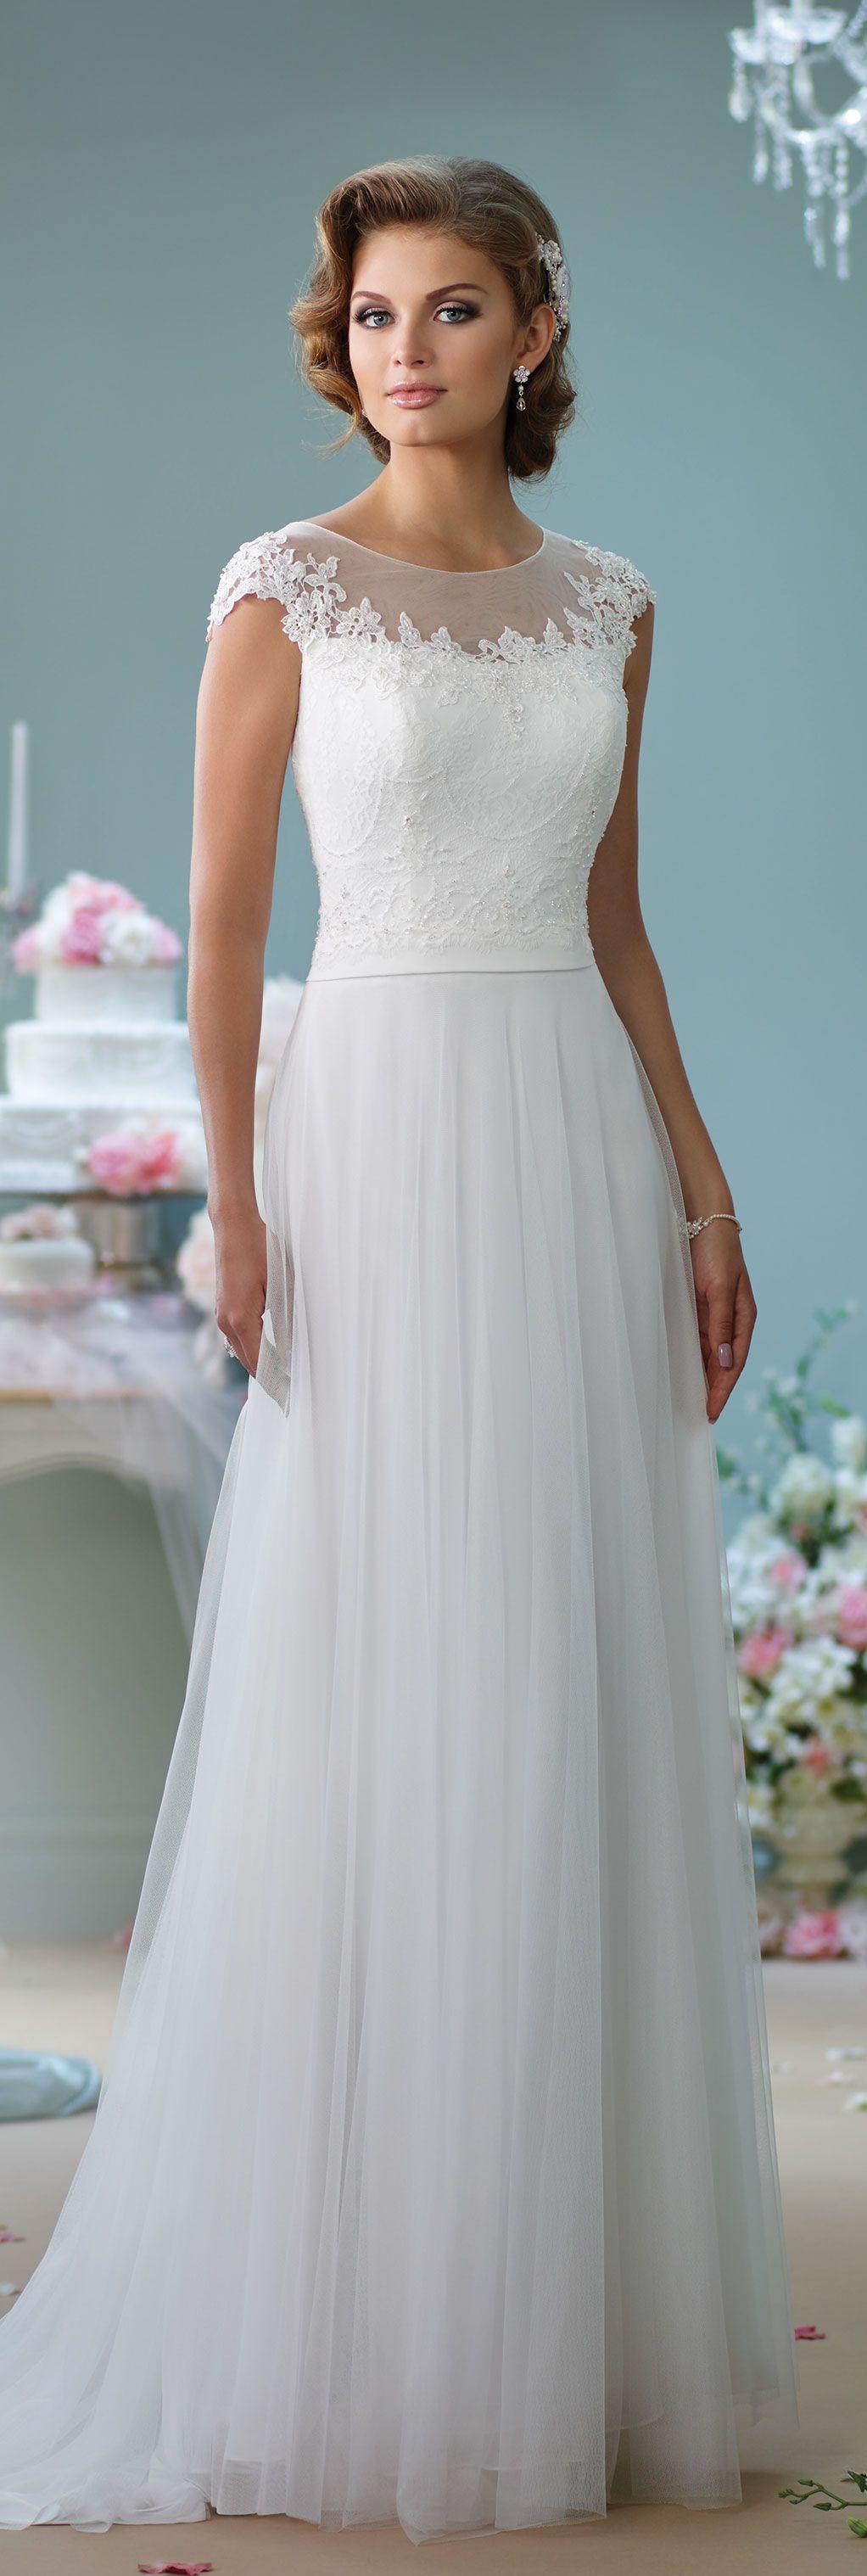 Wedding Dresses by Mon Cheri - Enchanting Spring 2016 ~Style No. 116137 #tulleweddingdress